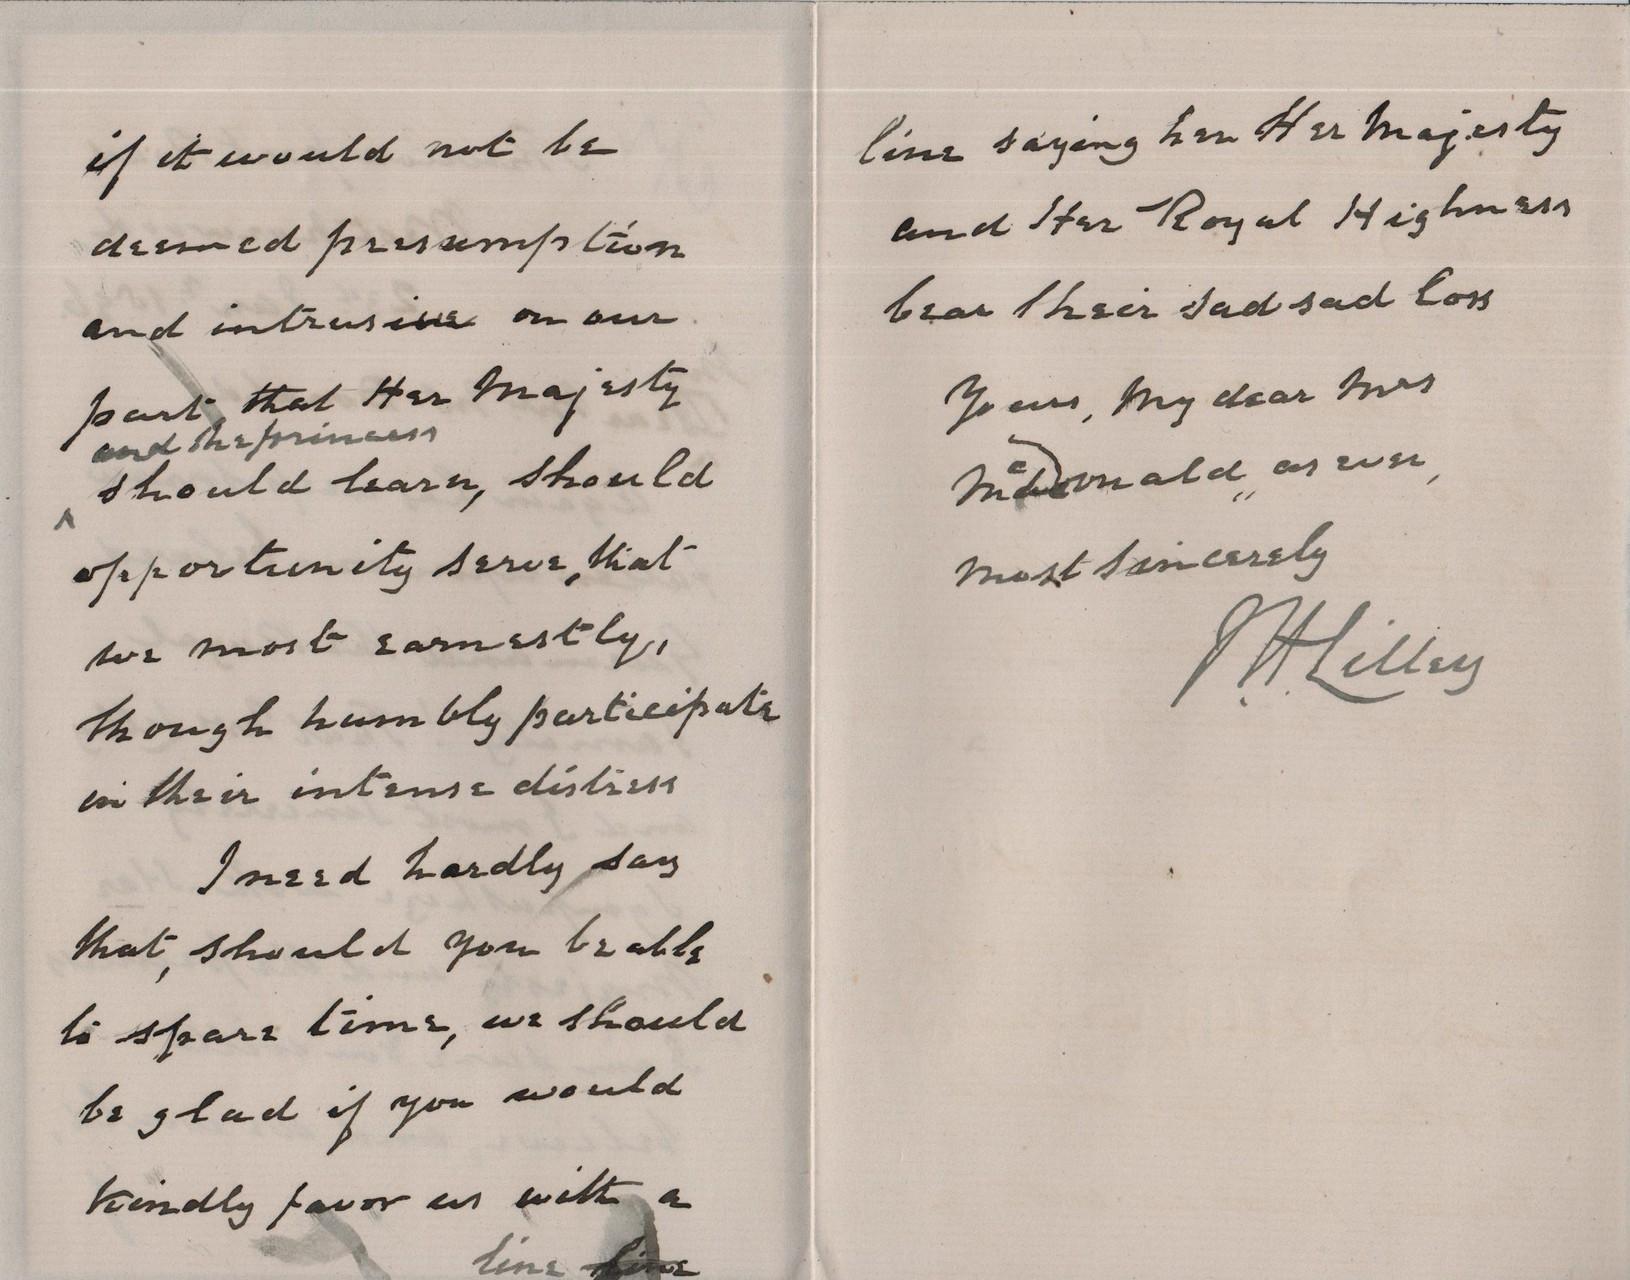 1896 January 23rd JHL to AMcD